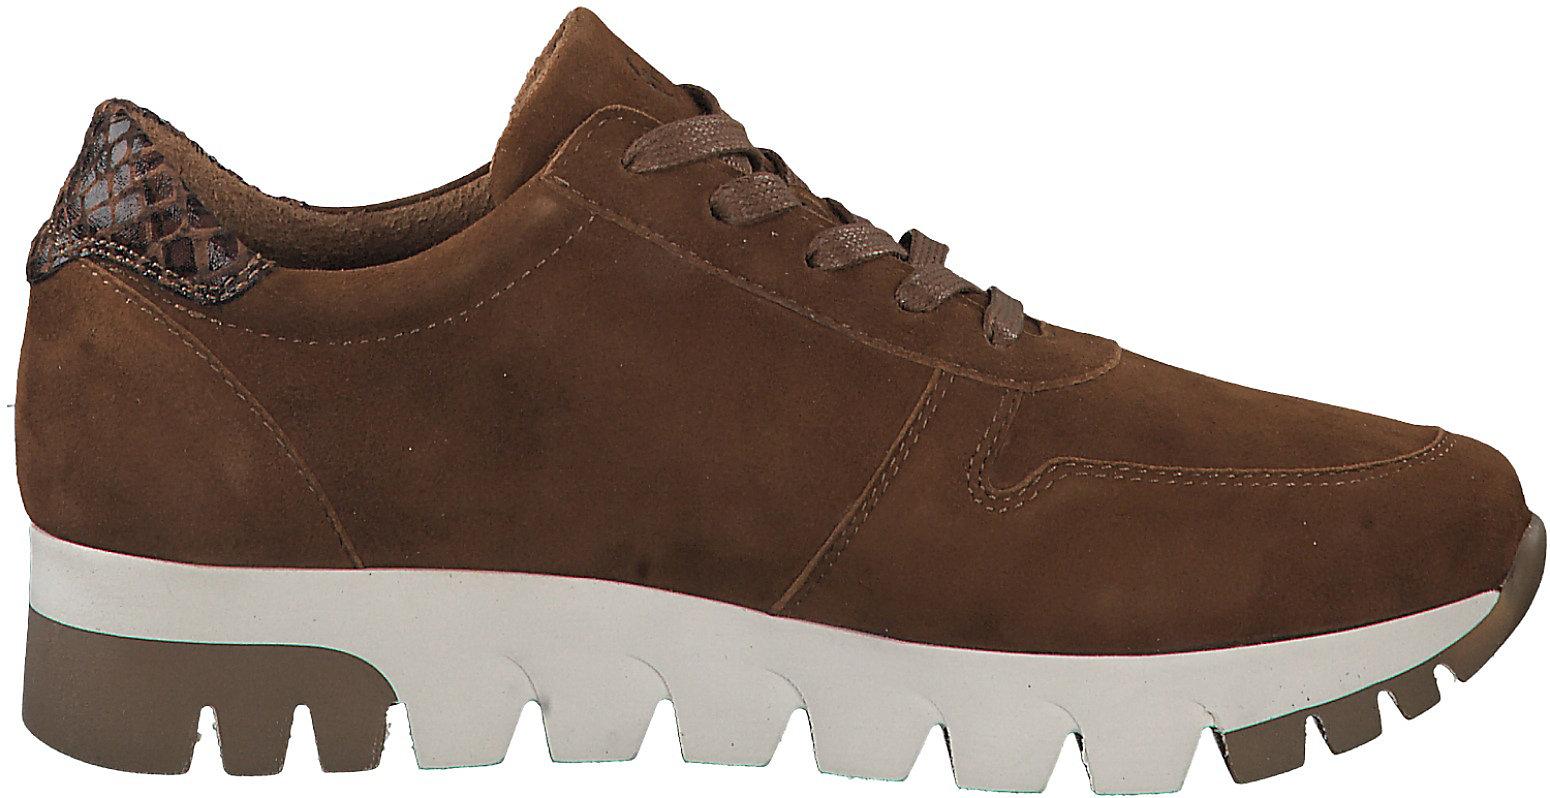 Neu Tamaris Sneakers Low 11409560 für Damen gelb